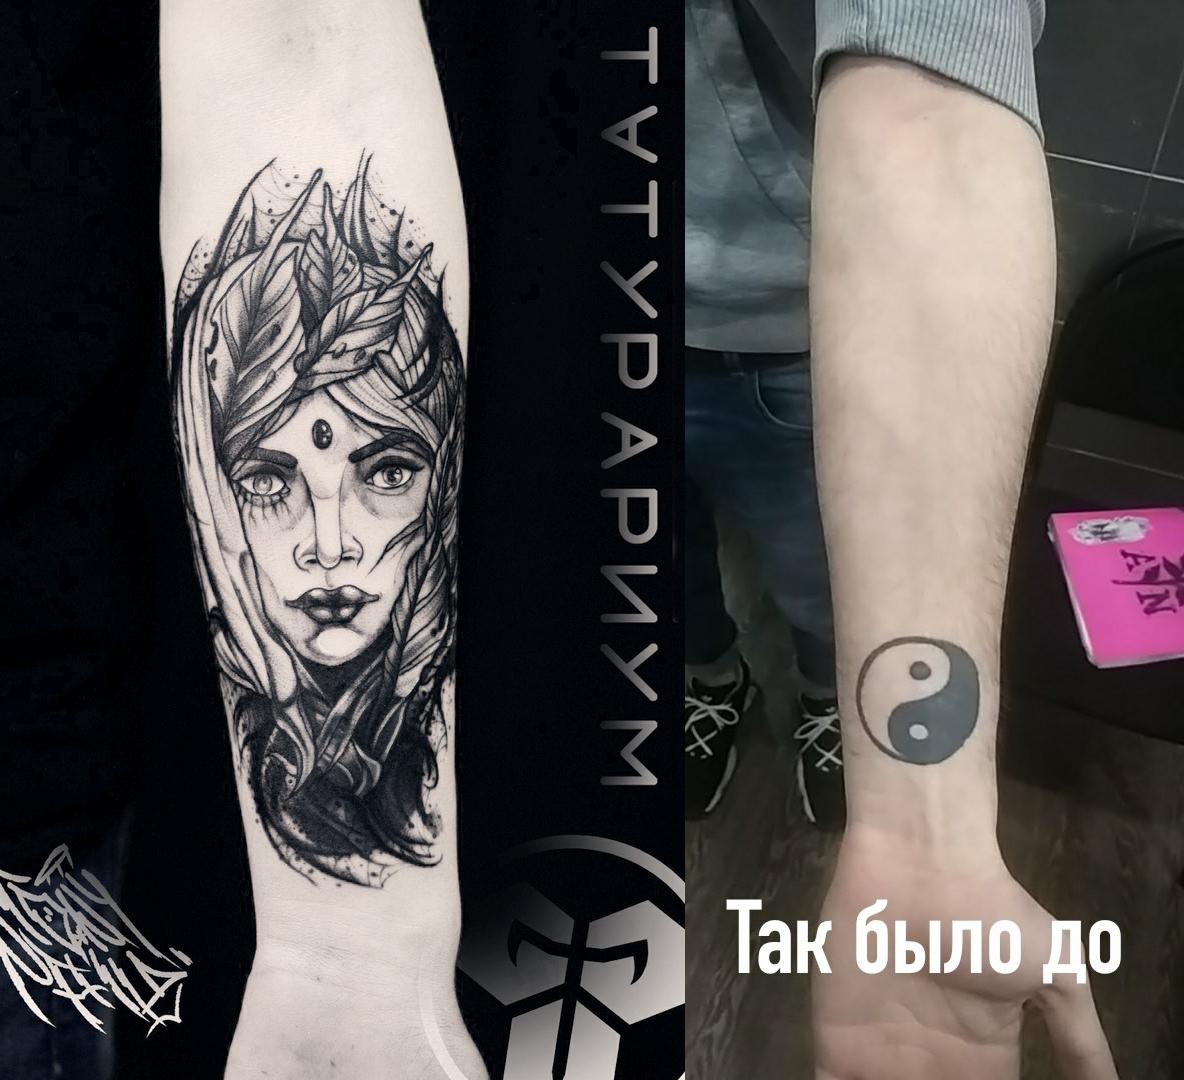 Фото татуировки, перекрыте у девушки зна